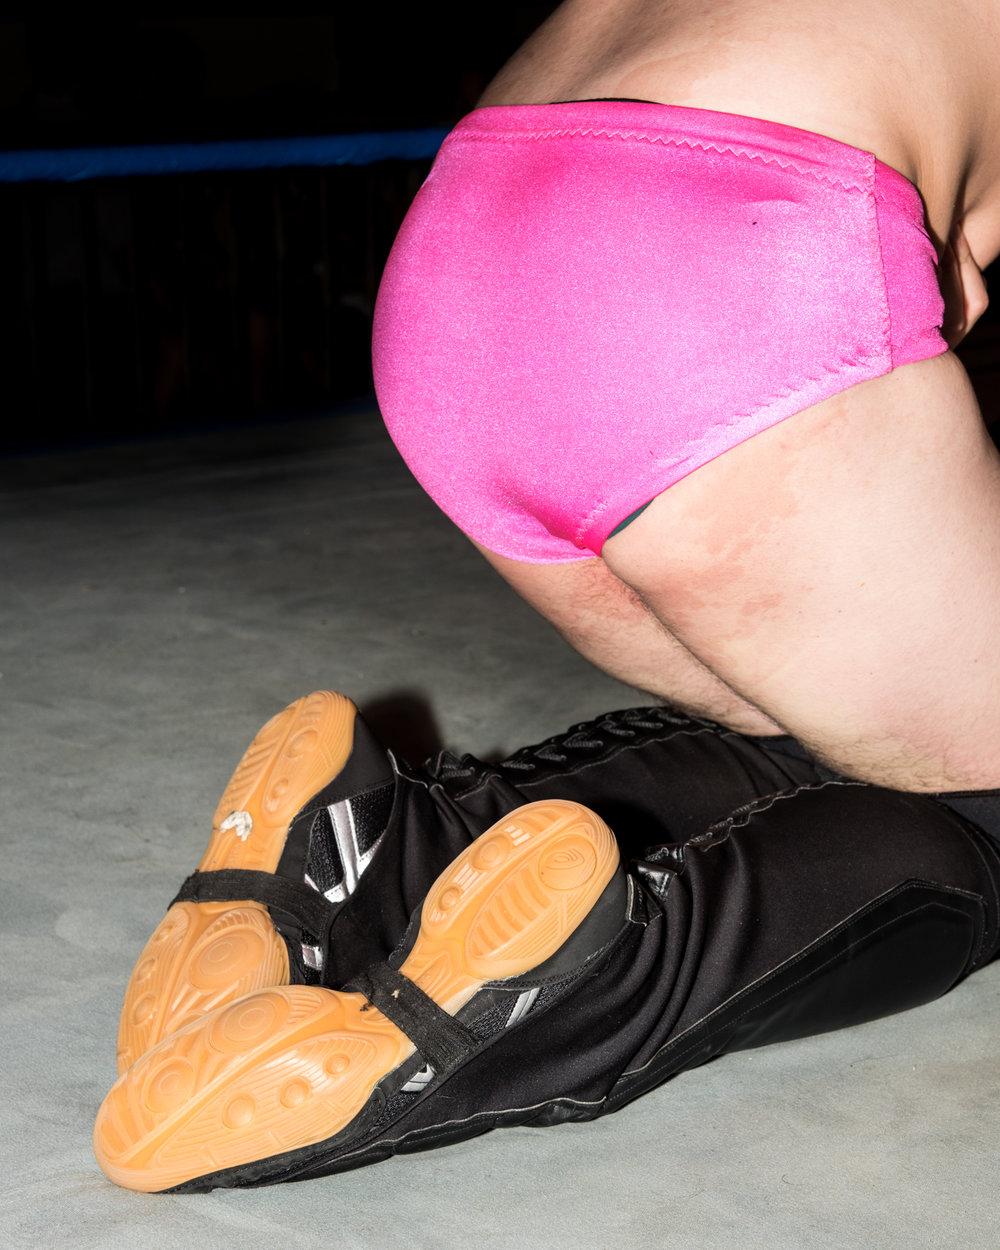 Pink Bottoms. Royston, GA. 2017. Digital Image.